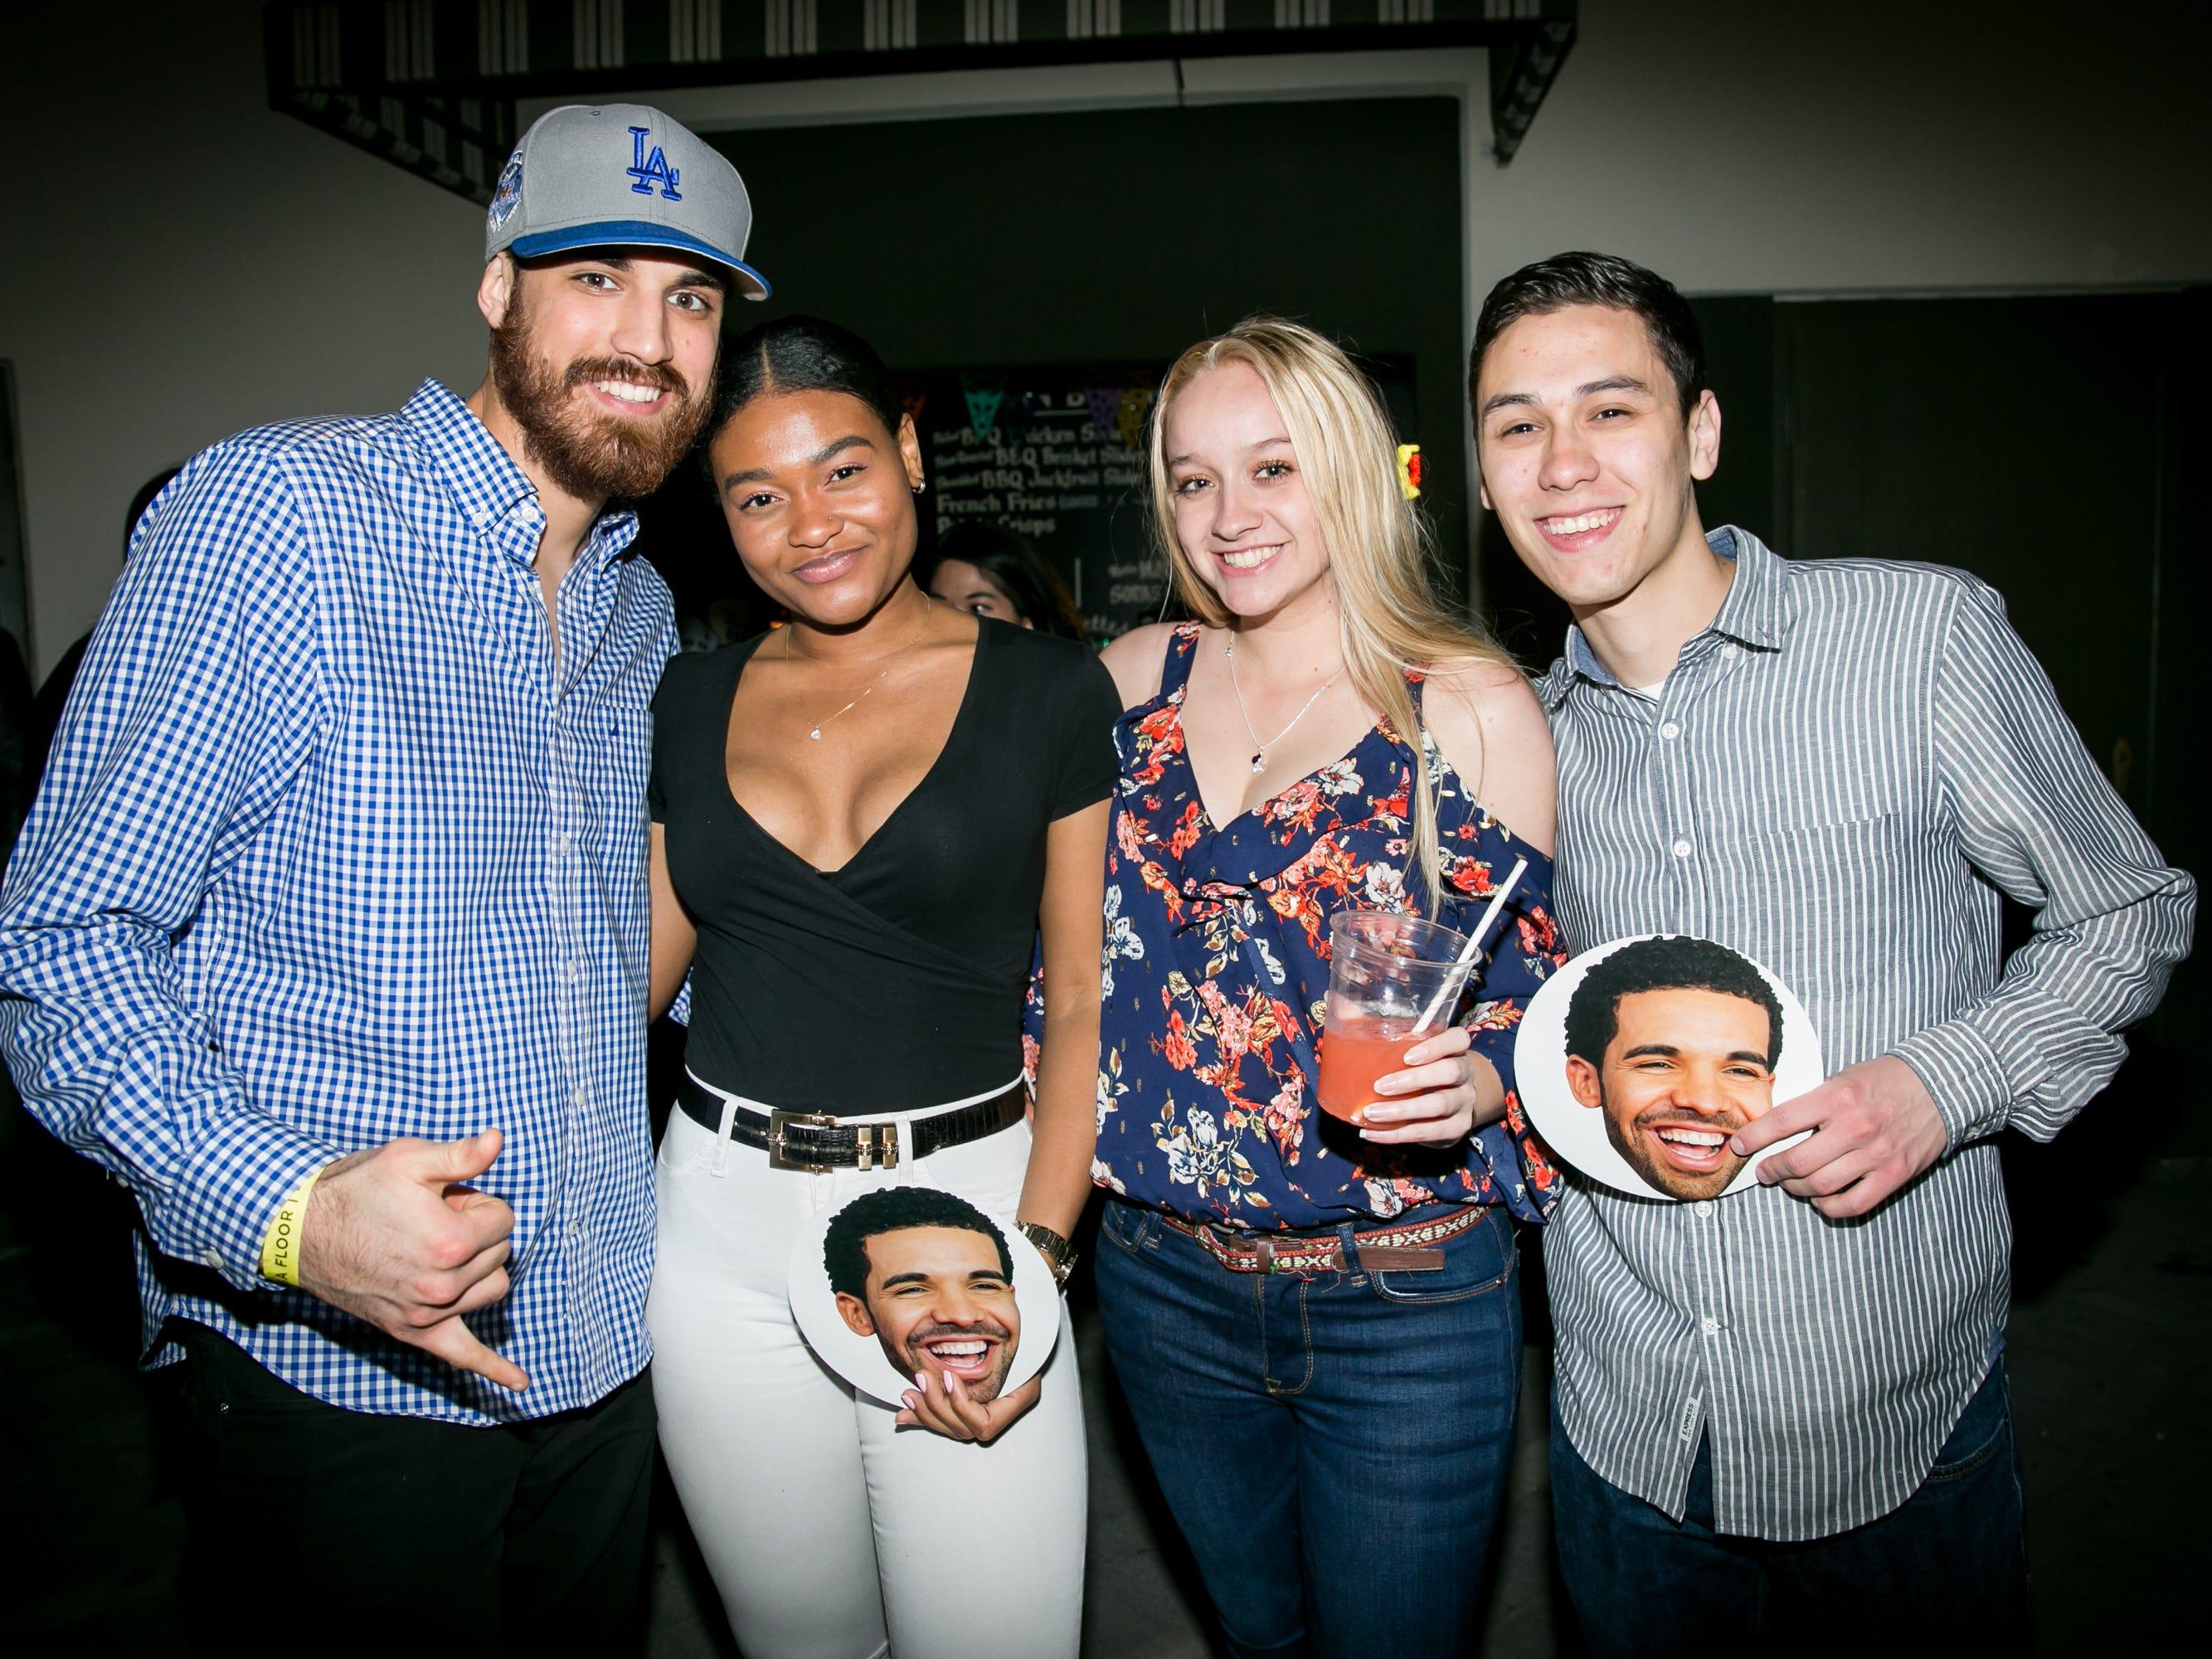 The Drake cutouts were great during Drake Night: Fake Real Love at The Van Buren on Feb. 9, 2019.